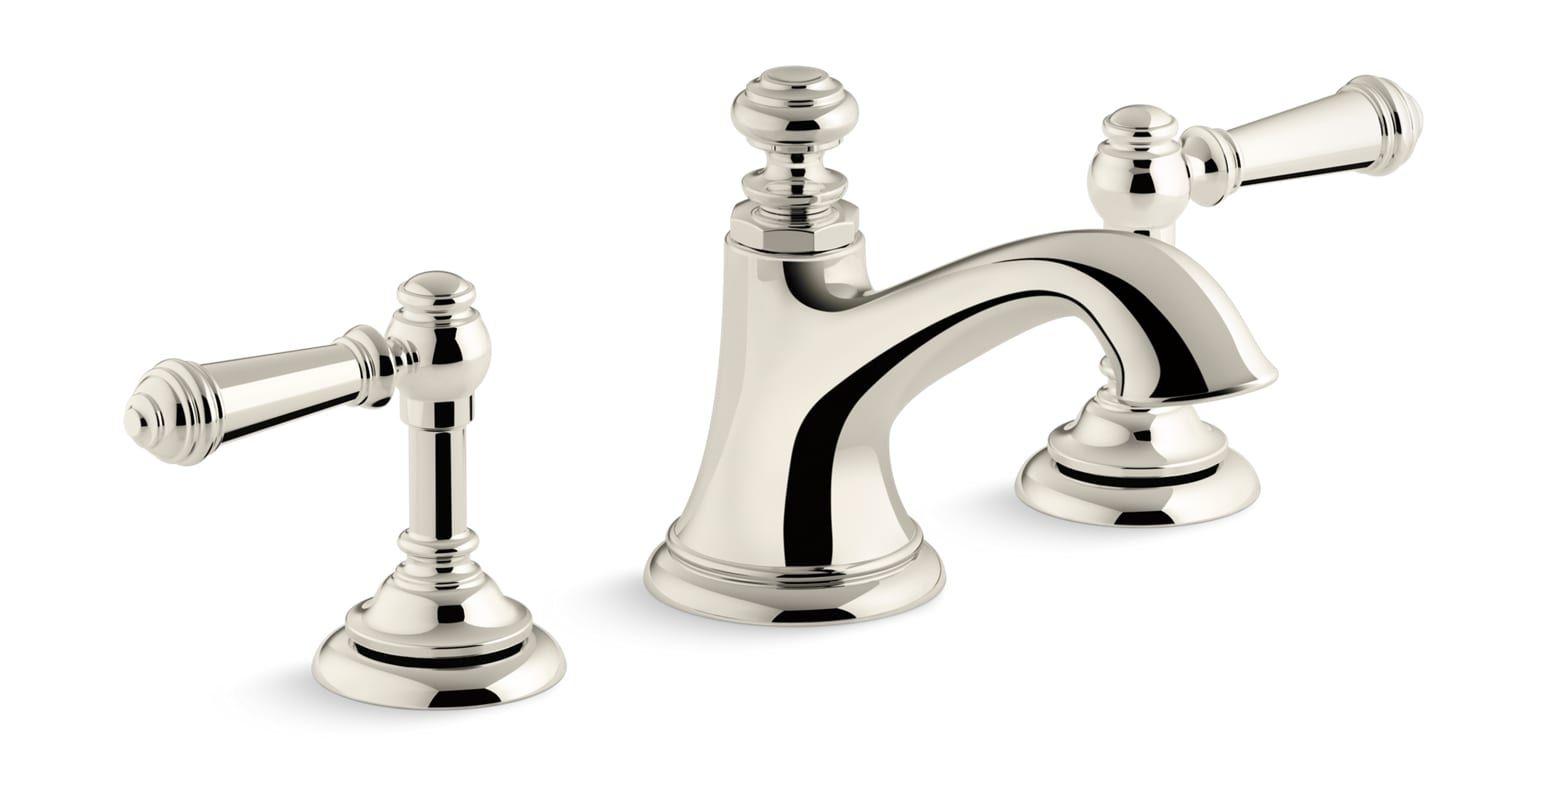 Kohler K 72759 4 Widespread Bathroom Faucet Faucet Polished Nickel